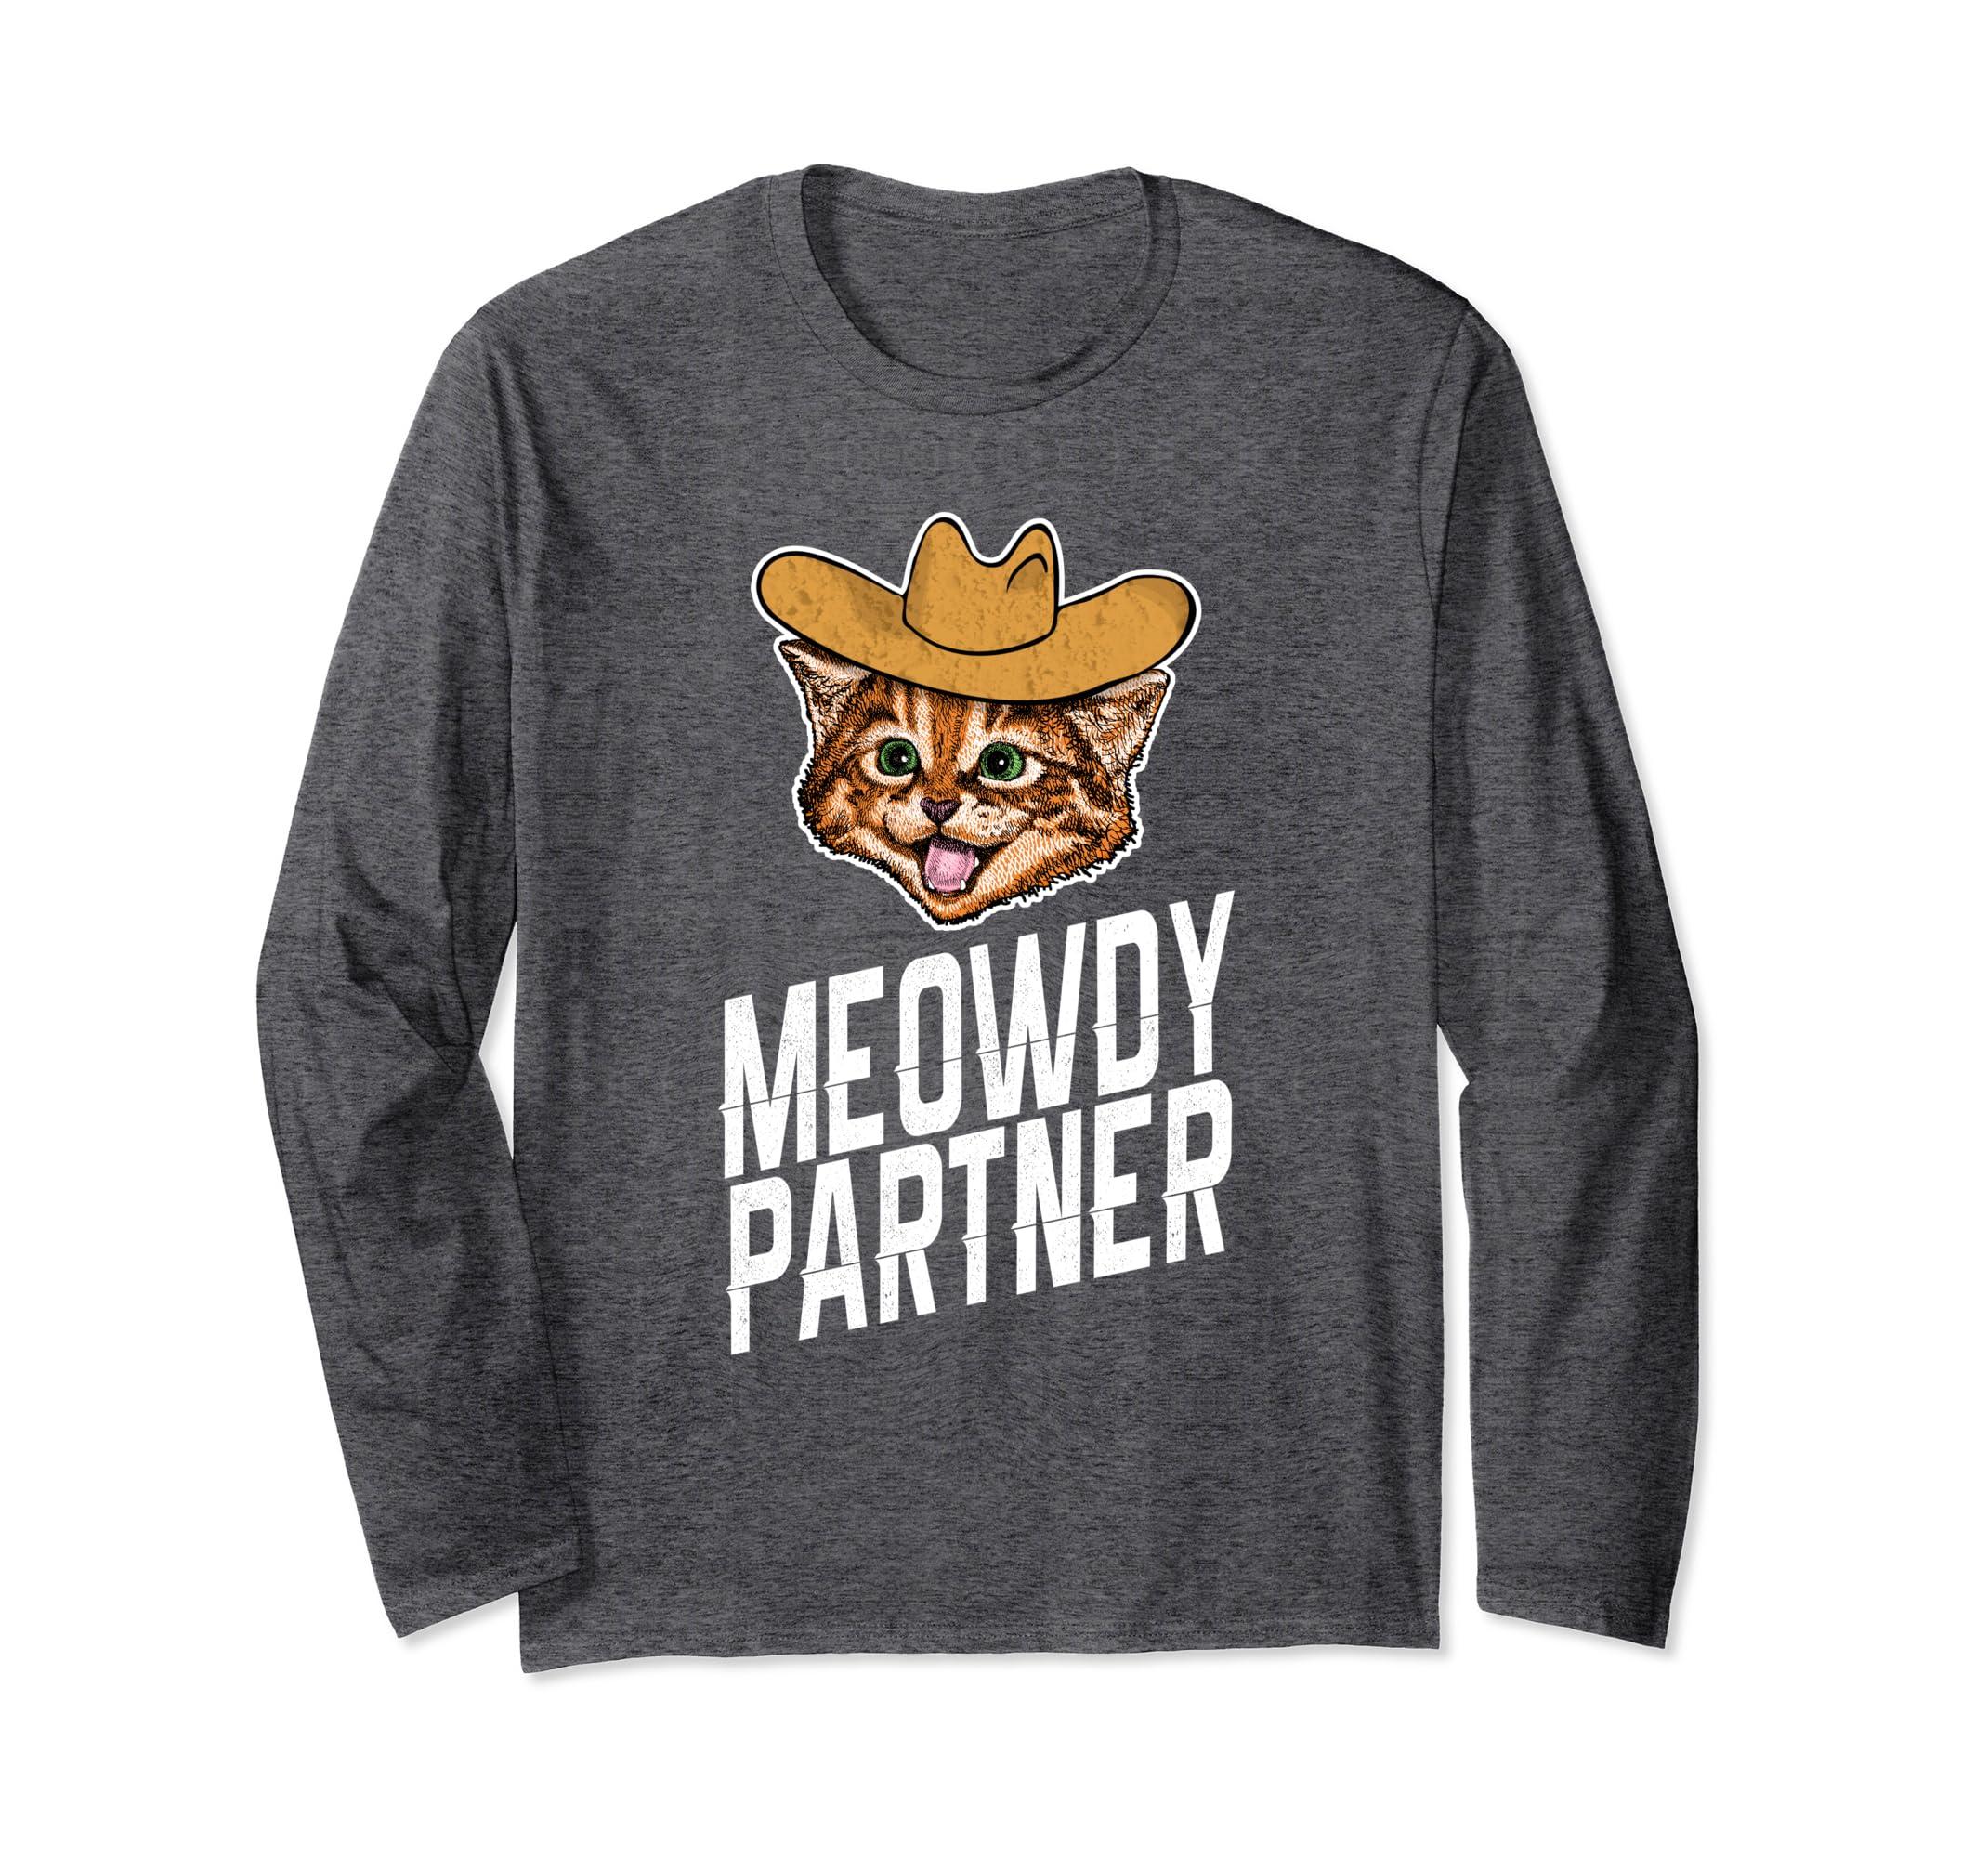 e5ffdbf9e3 Amazon.com: Meowdy Partner Cat Long Sleeve Shirt , Funny Western Cowboy:  Clothing